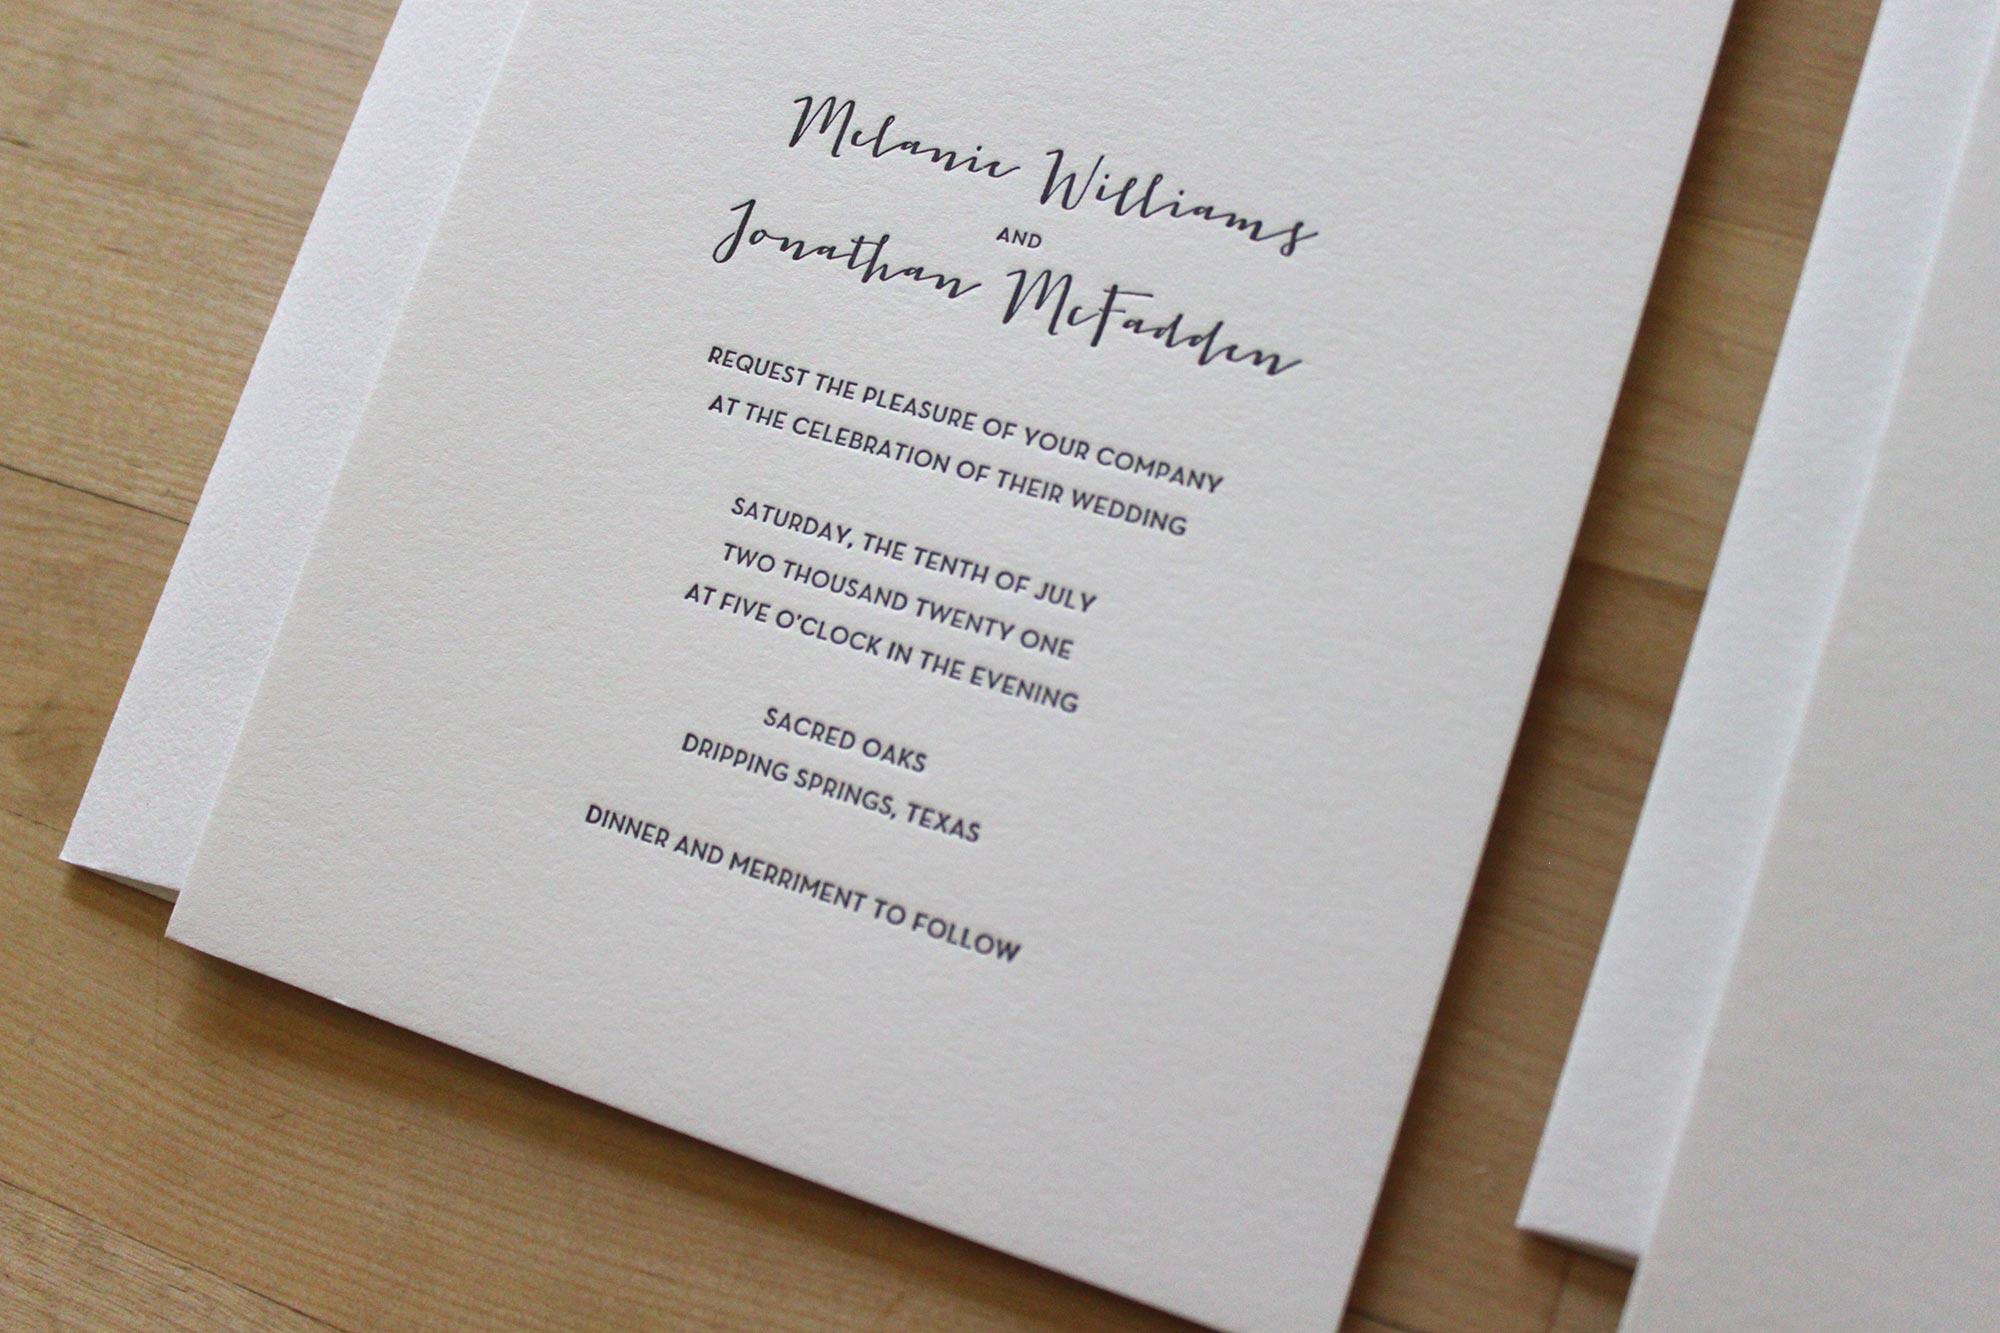 Cactus-2-letterpress-wedding-invitations.jpg